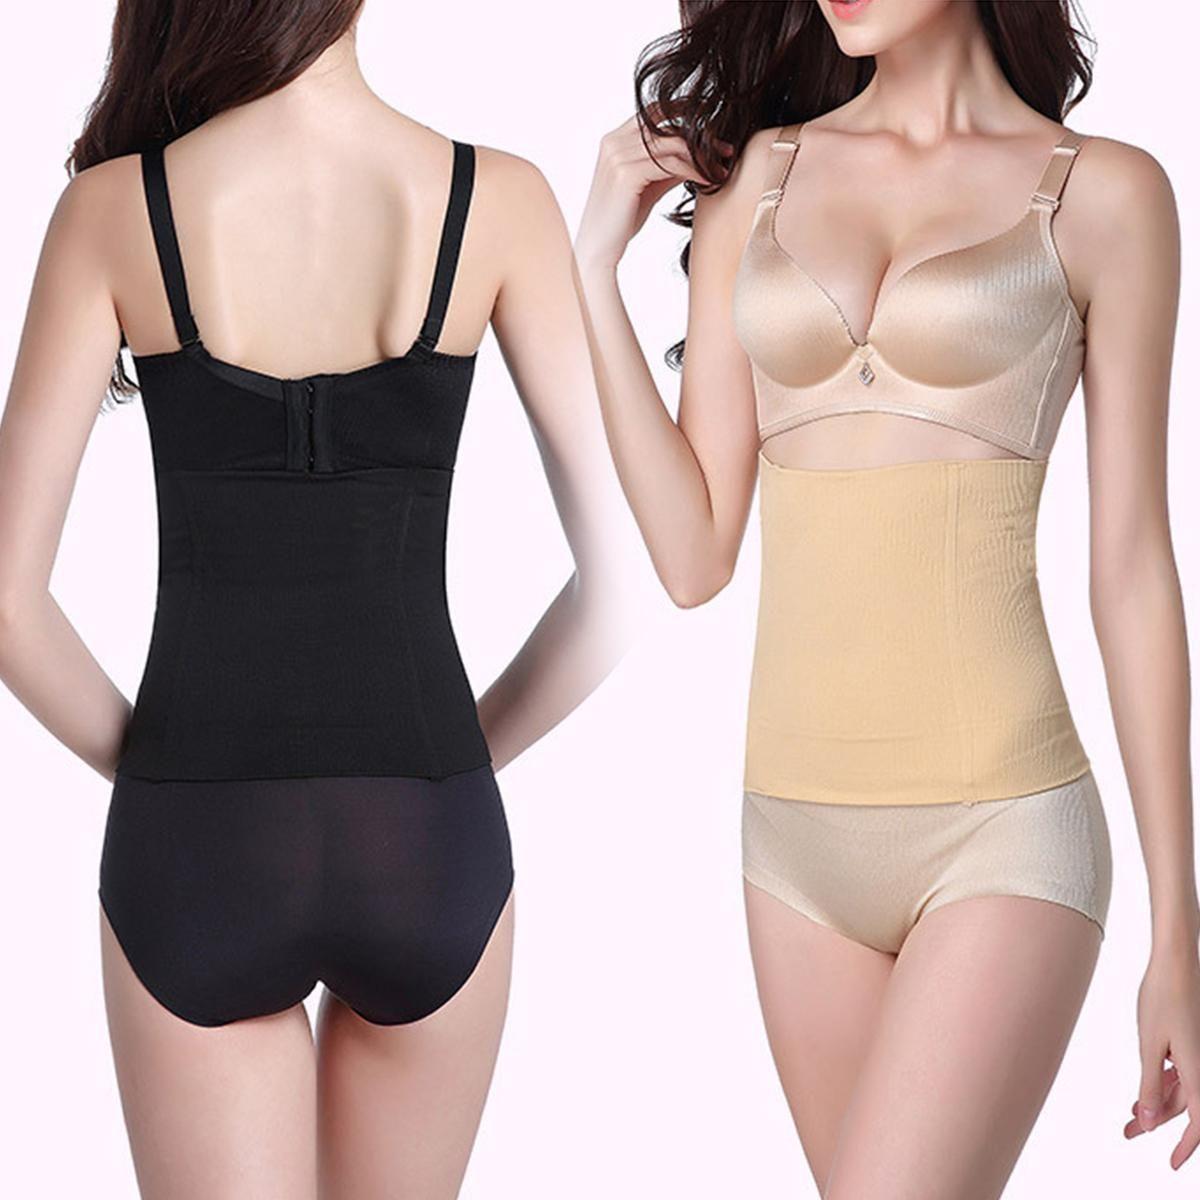 f7d5edf753256  BangGood -  Eachine1 Women Belly Slimming Body Waist Shaper Training Tummy  Girdle Trainer Corset